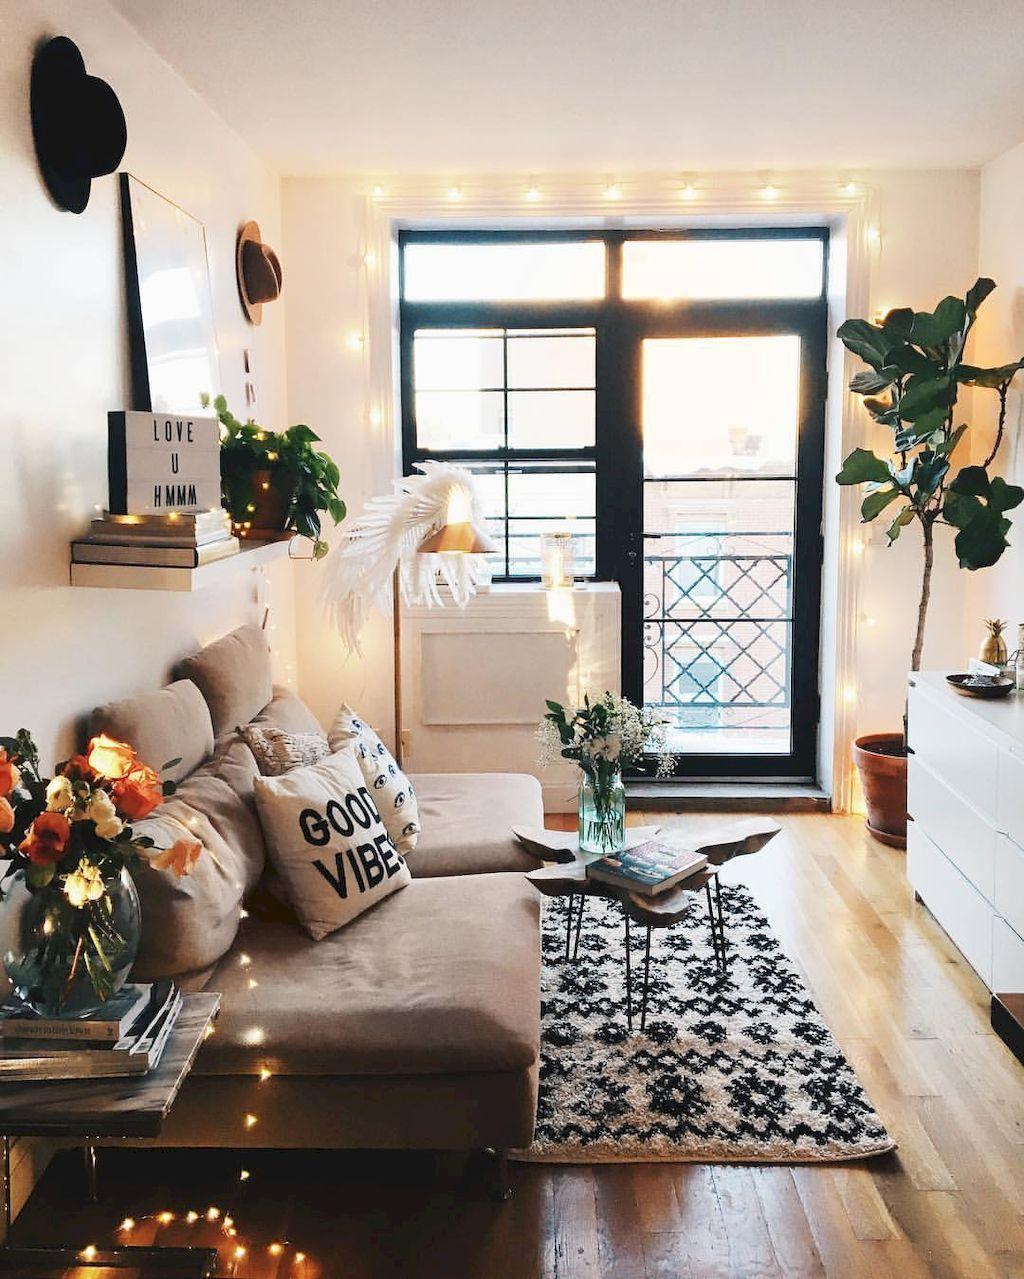 Cozy Small Living Room Decor For Apartment Ideas 59 Small